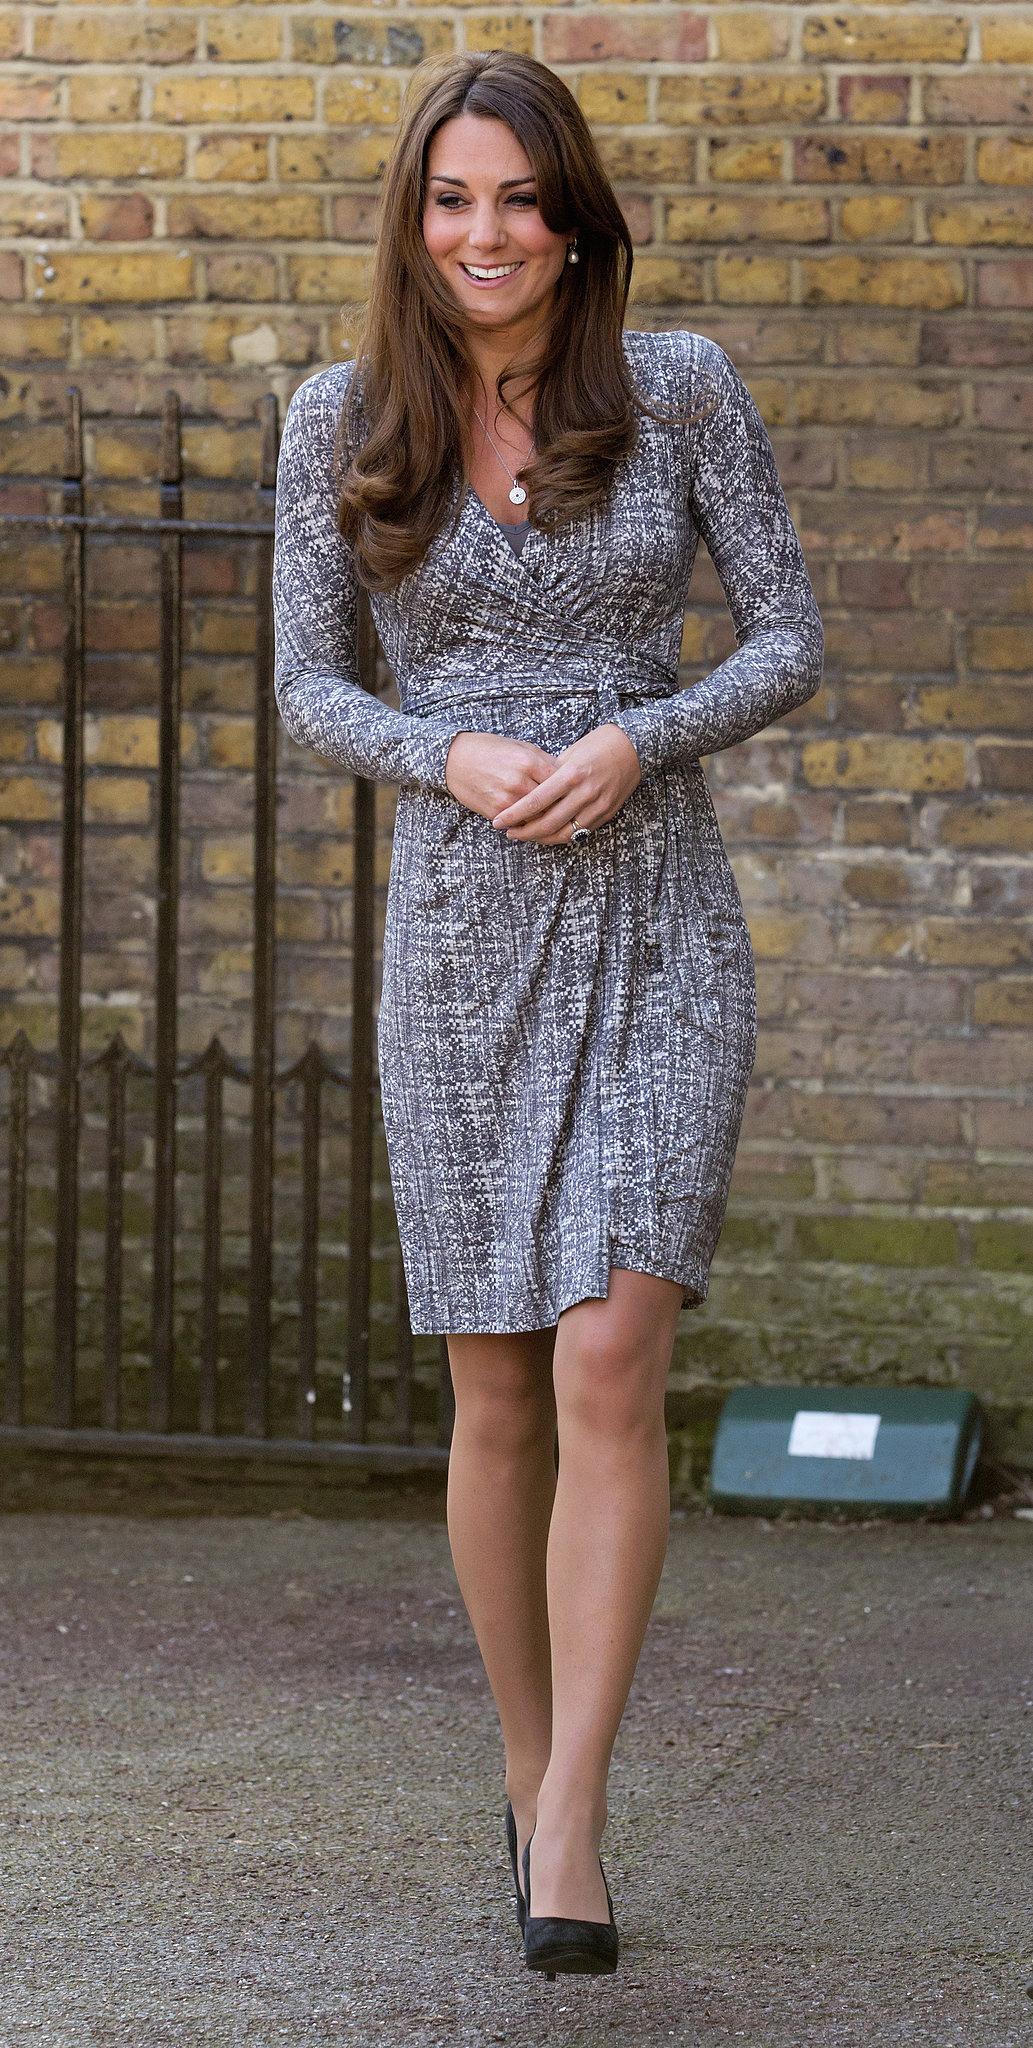 On Feb 19 Kate Middleton Visited Hope House In London